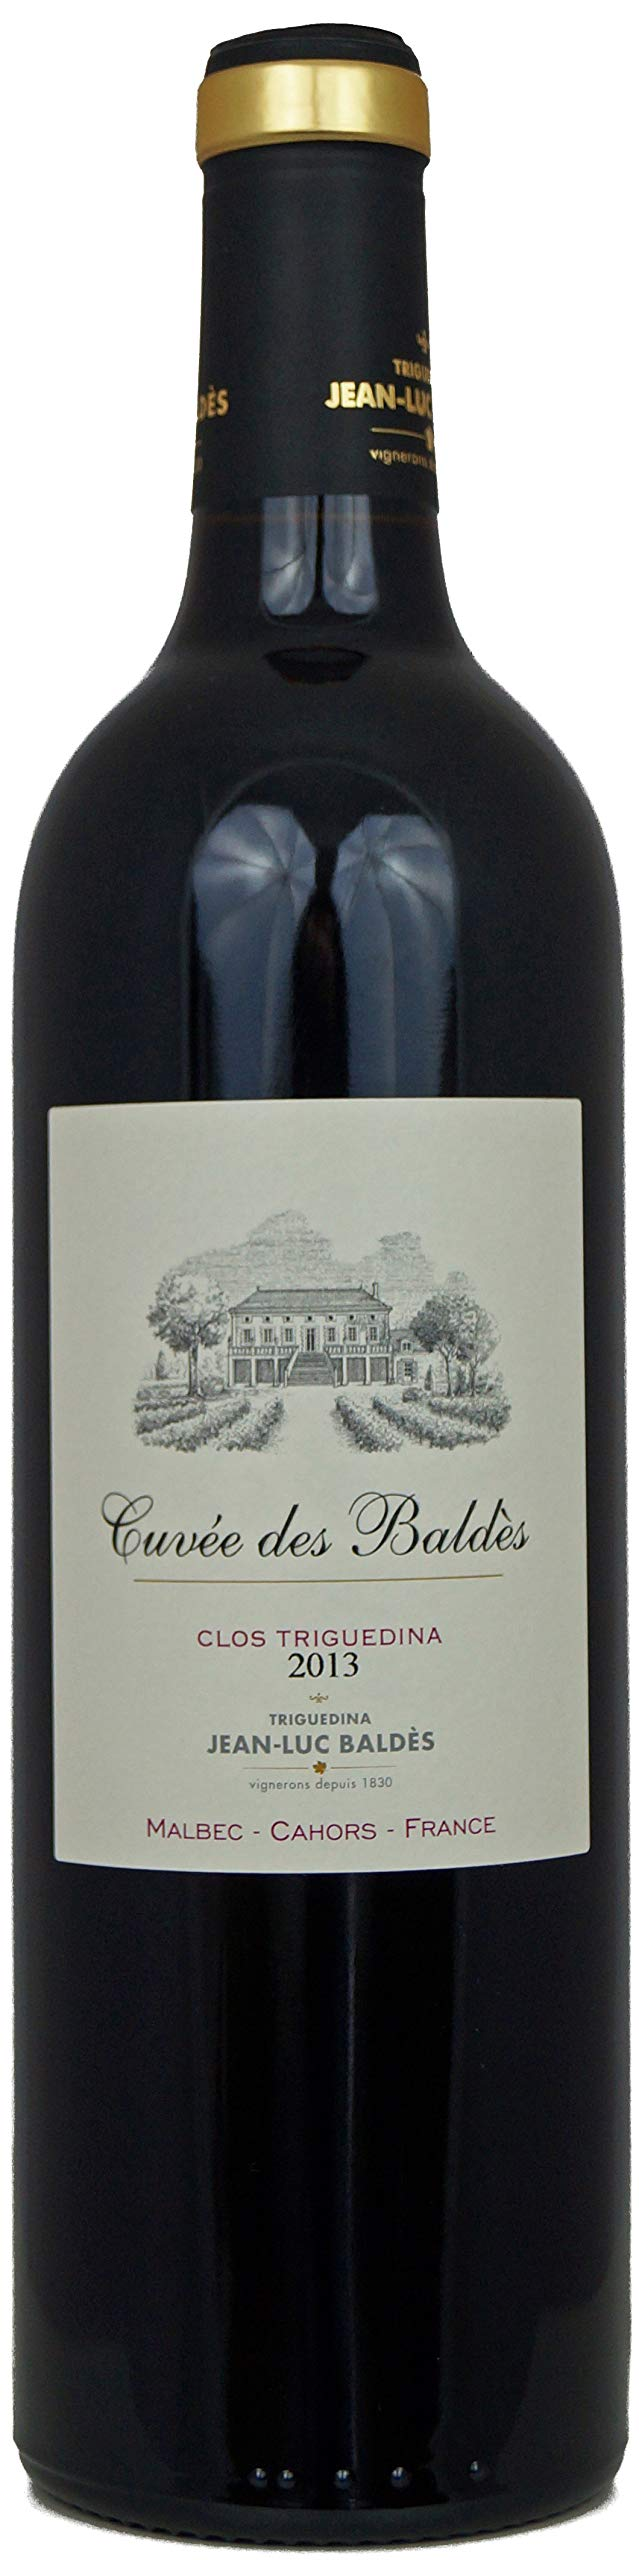 Clos-Triguedina-Rotwein-CahorsCuve-des-Balds-Frankreich-2013